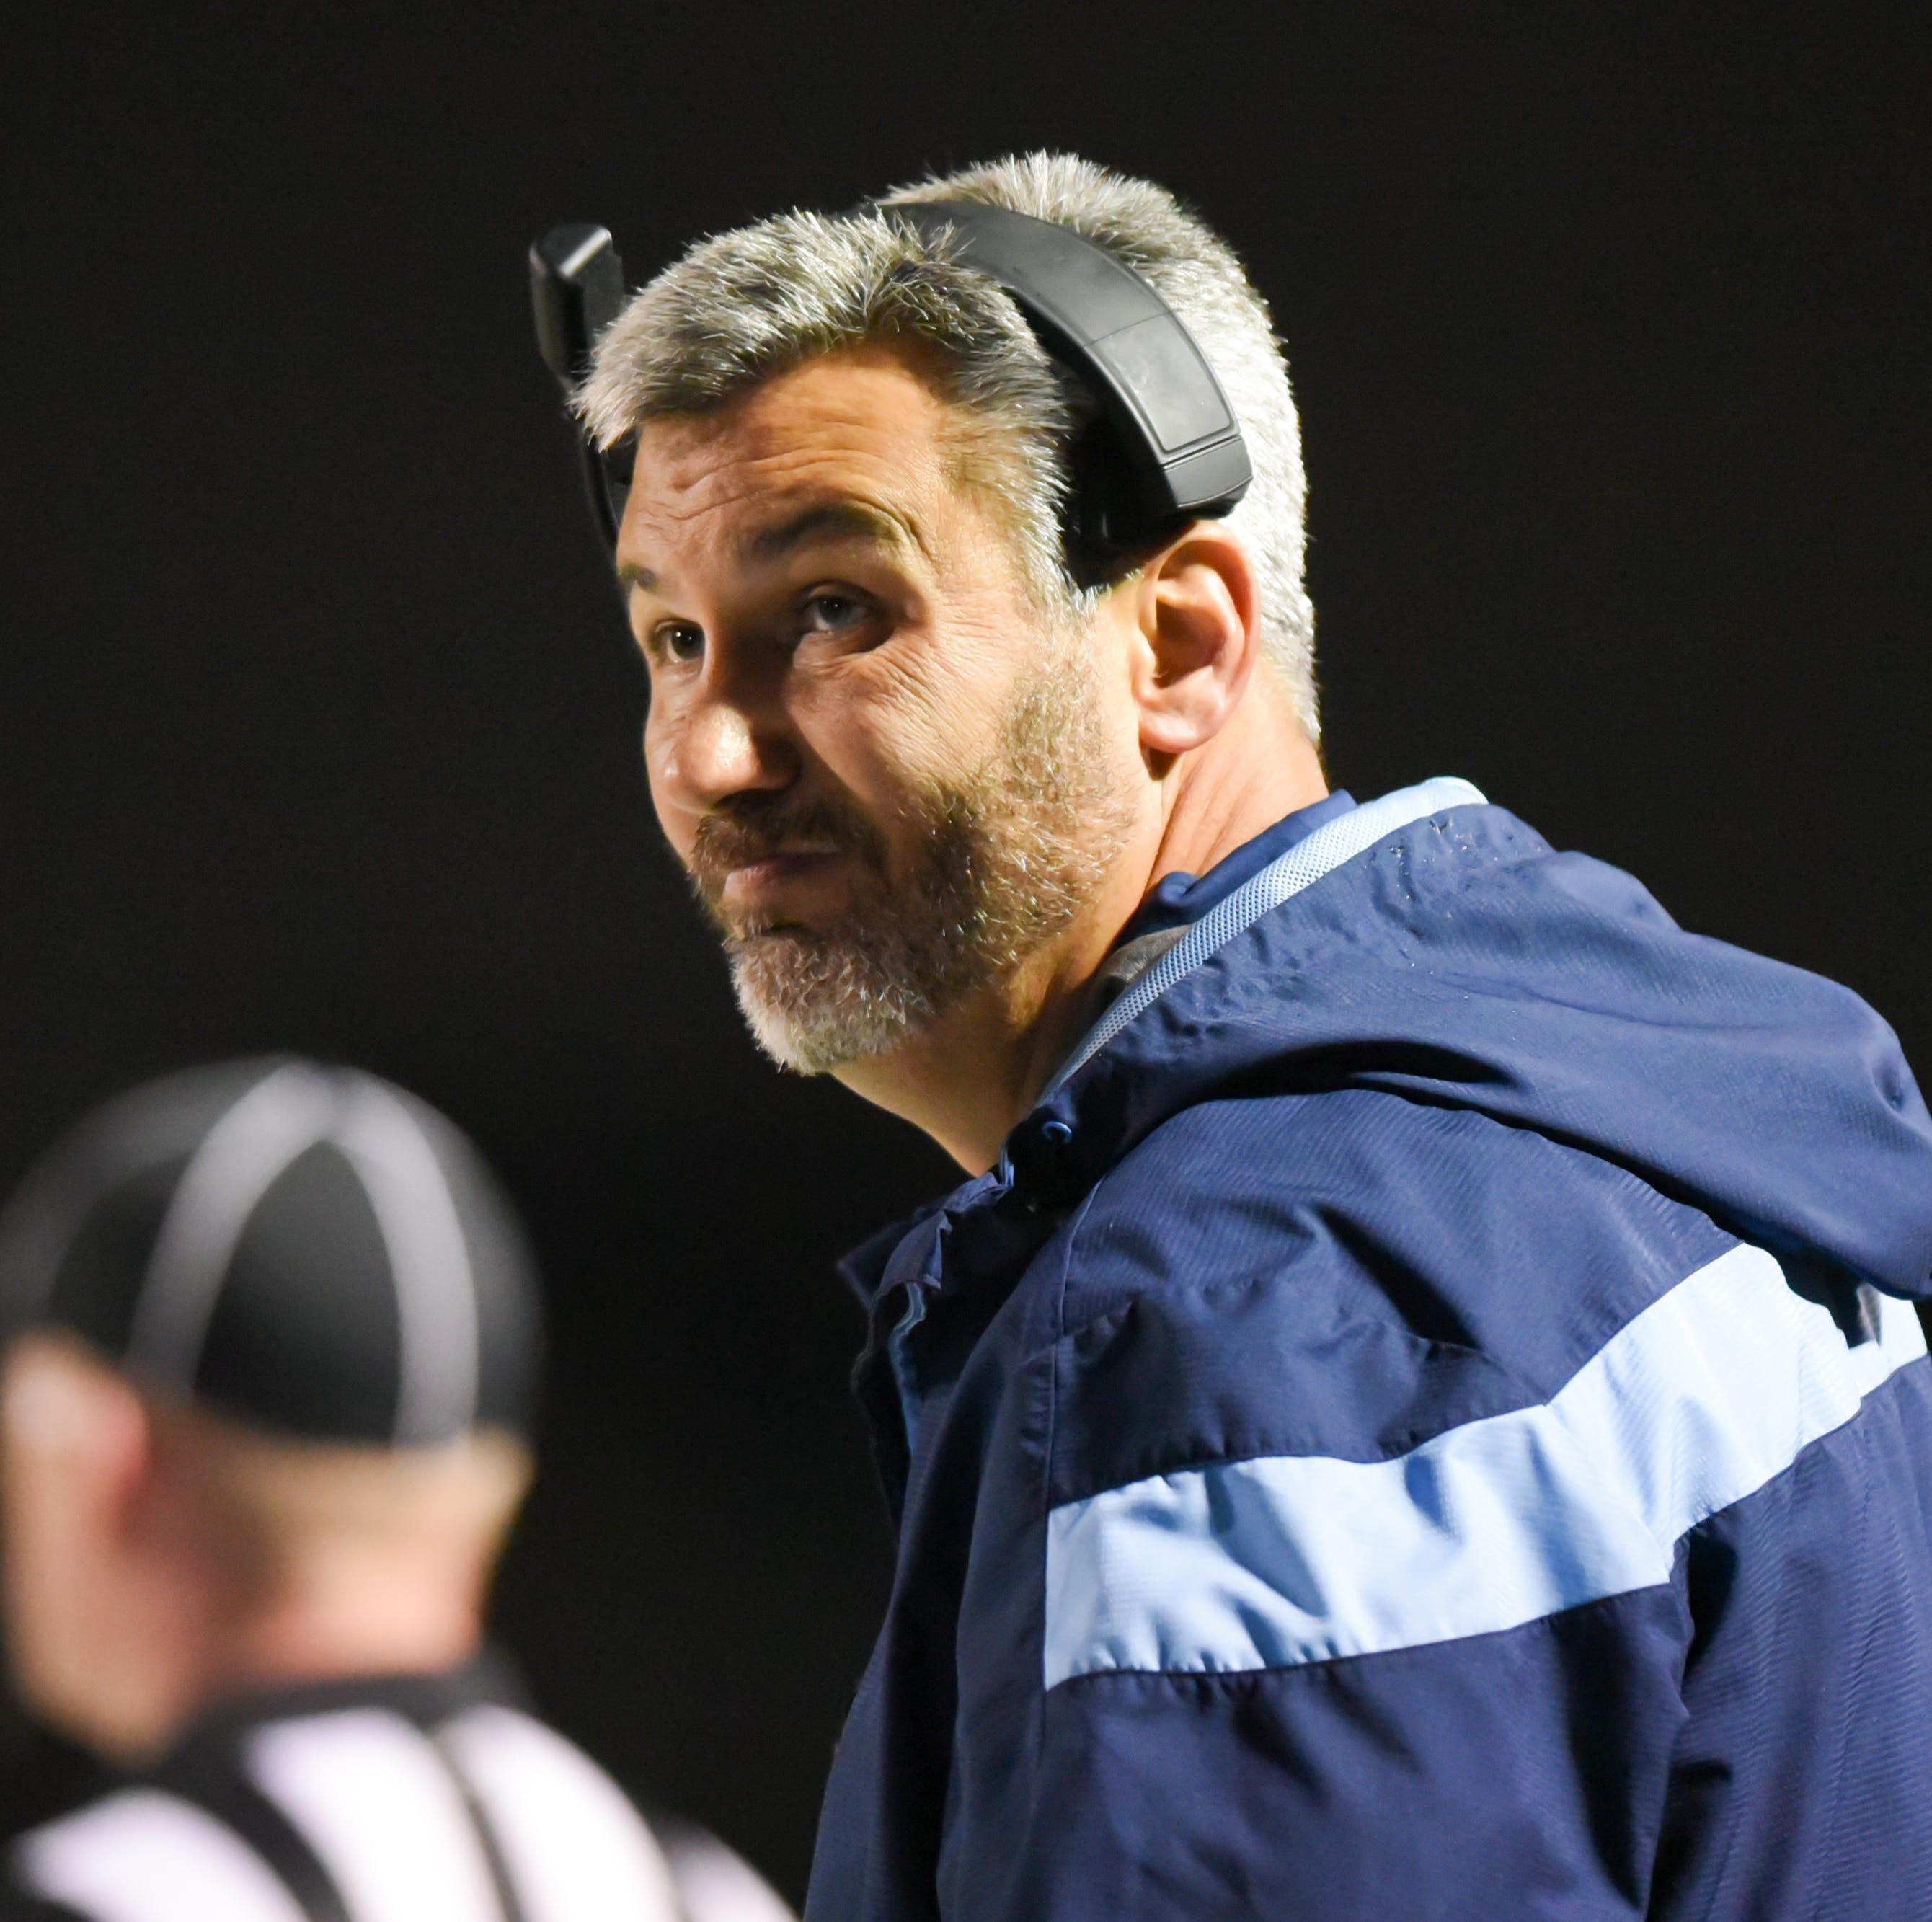 Wes Jones resigns as Hardin Valley football coach